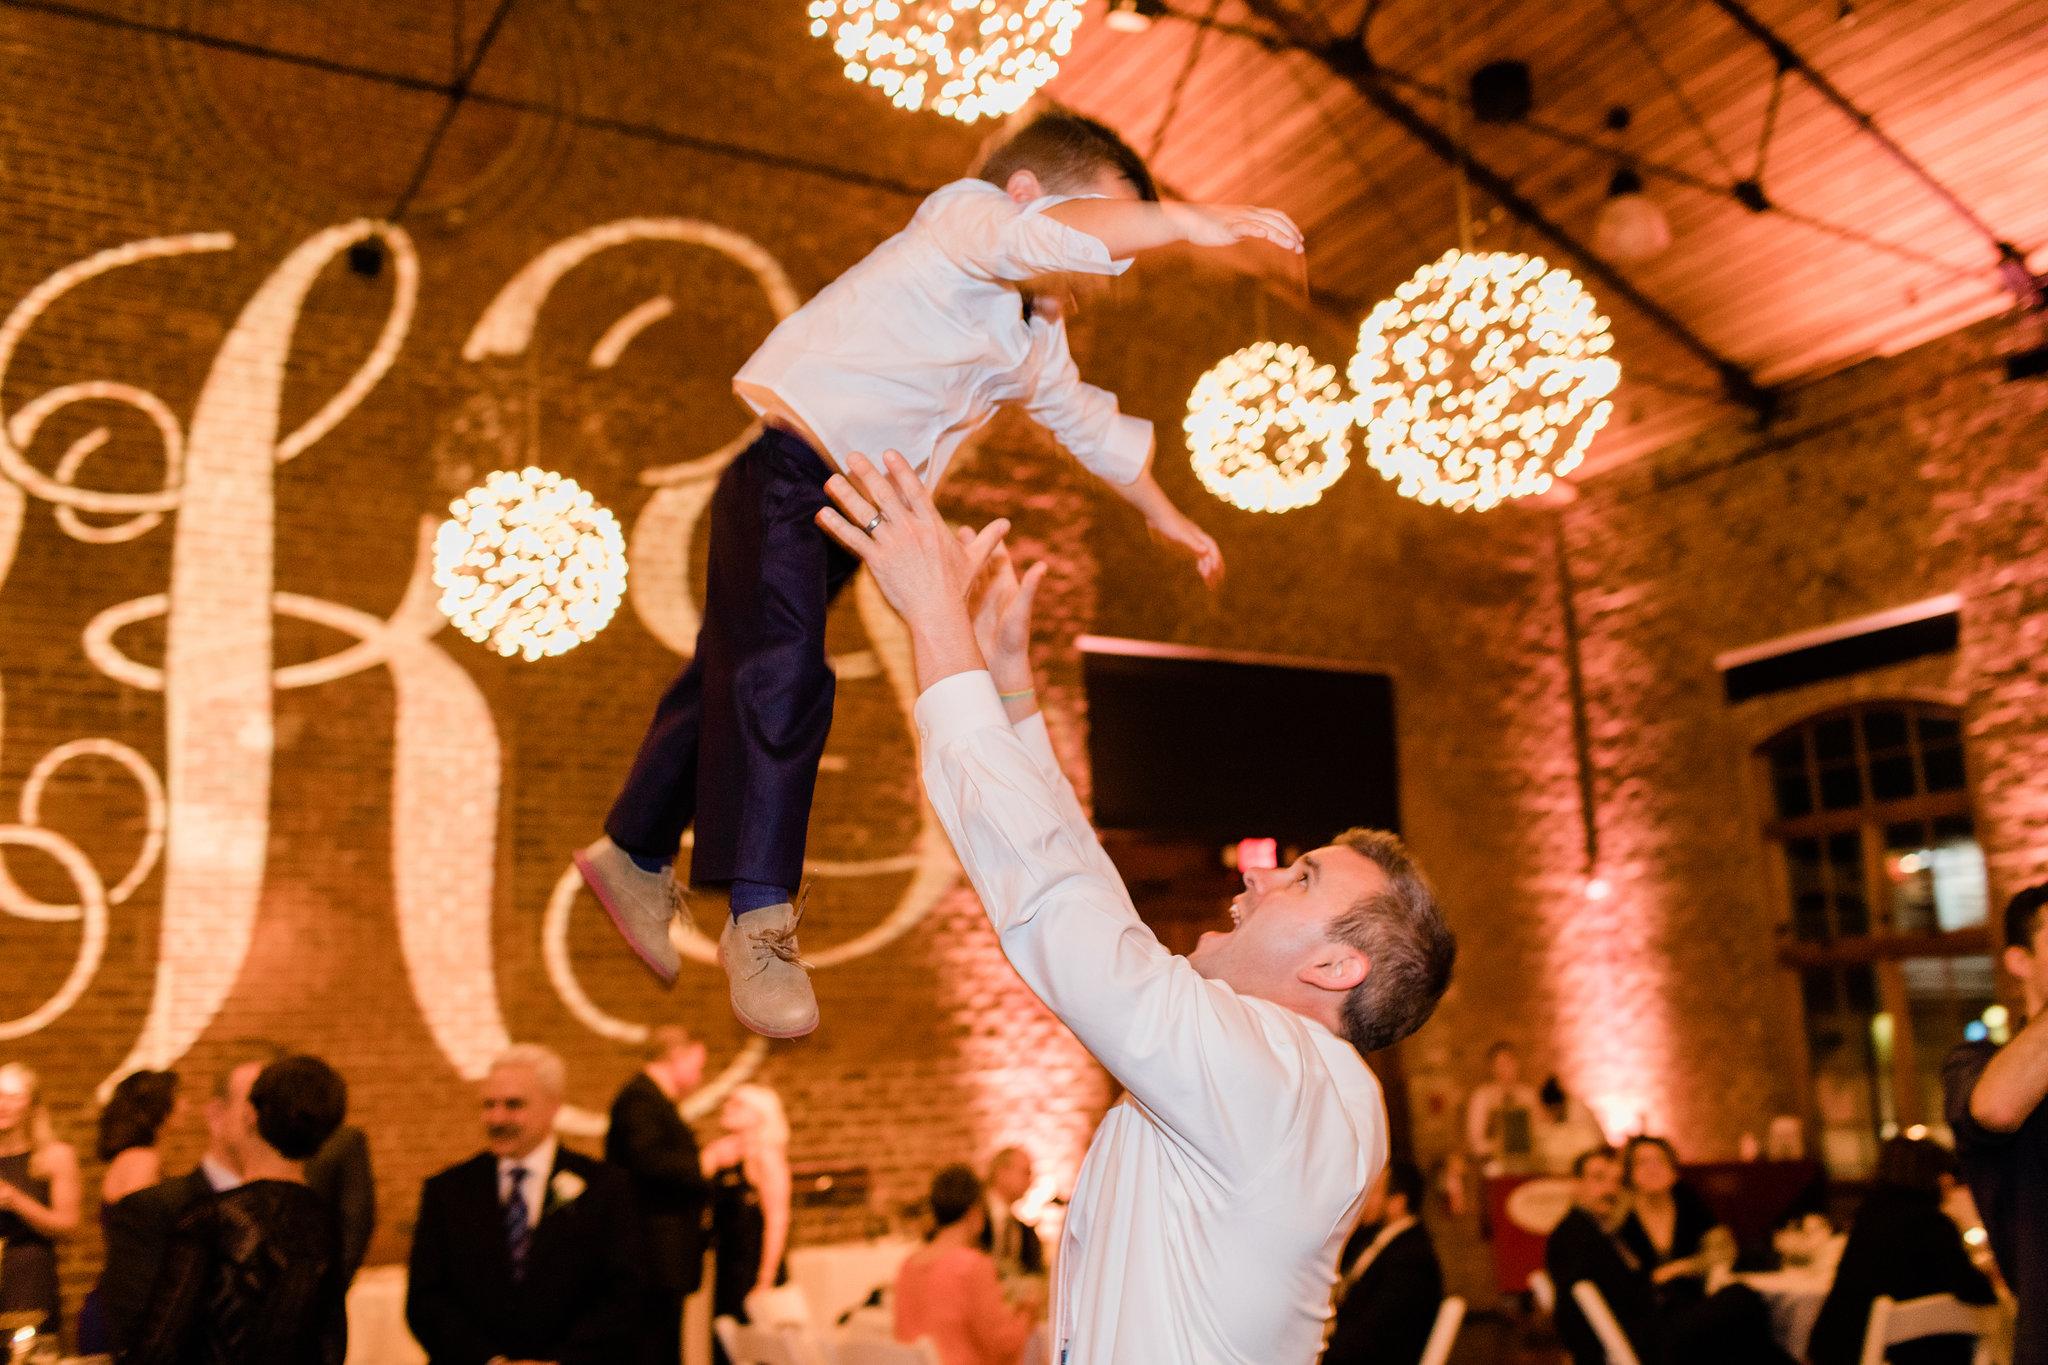 apt-b-photography-Savannah-wedding-photographer-savannah-engagement-photographer-historic-savannah-engagement-charles-h-morris-center-wedding-savannah-weddings-49.JPG